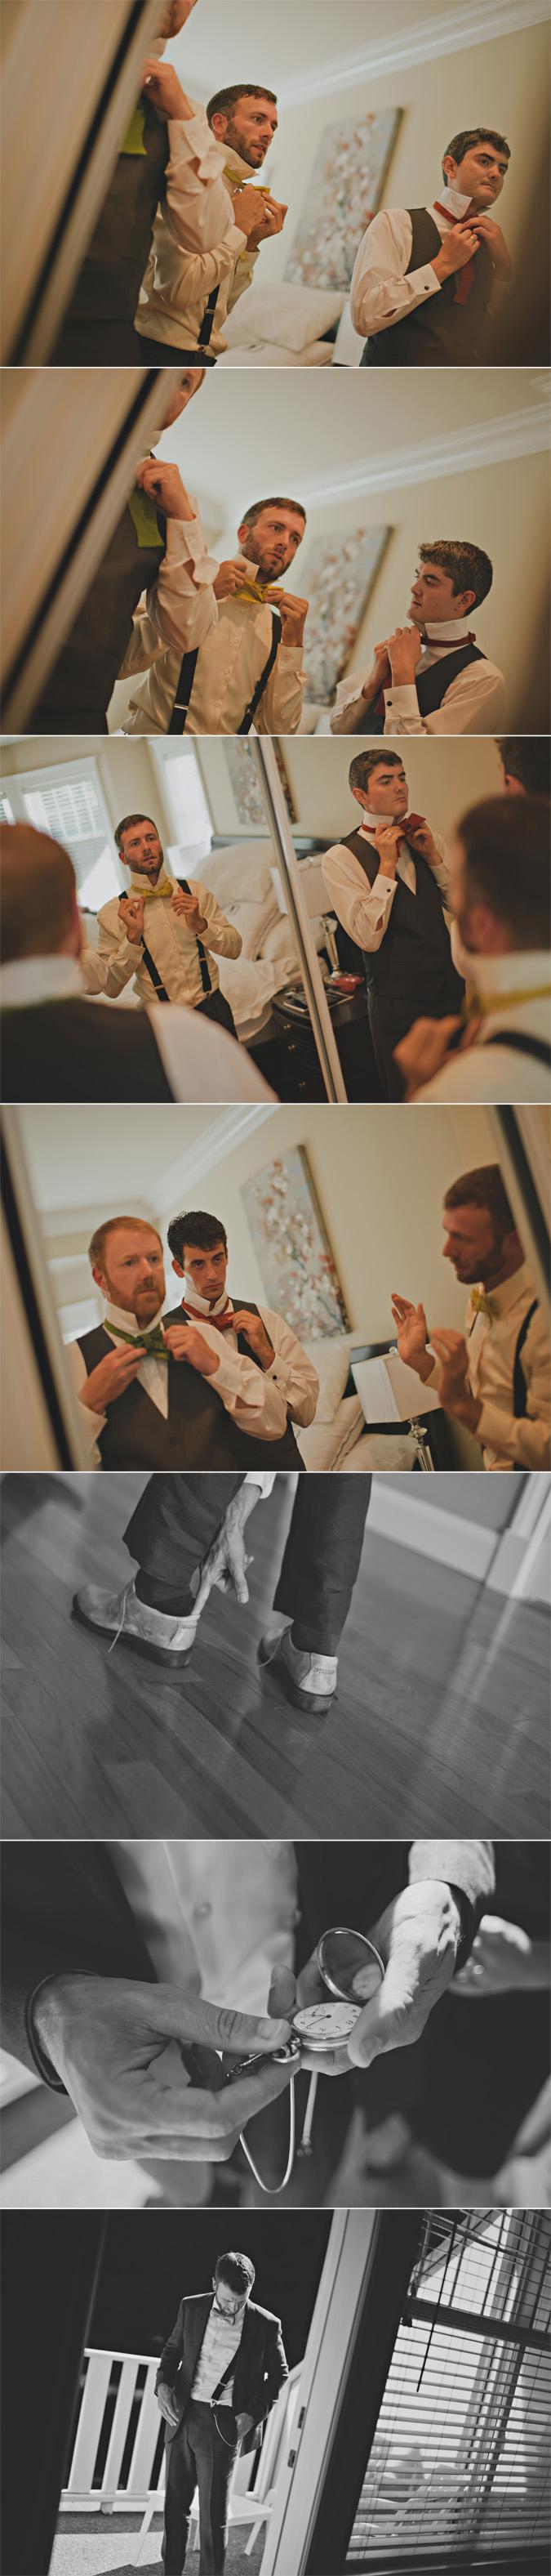 groom & groomsmen getting ready on his wedding day, qualicum beach, bc